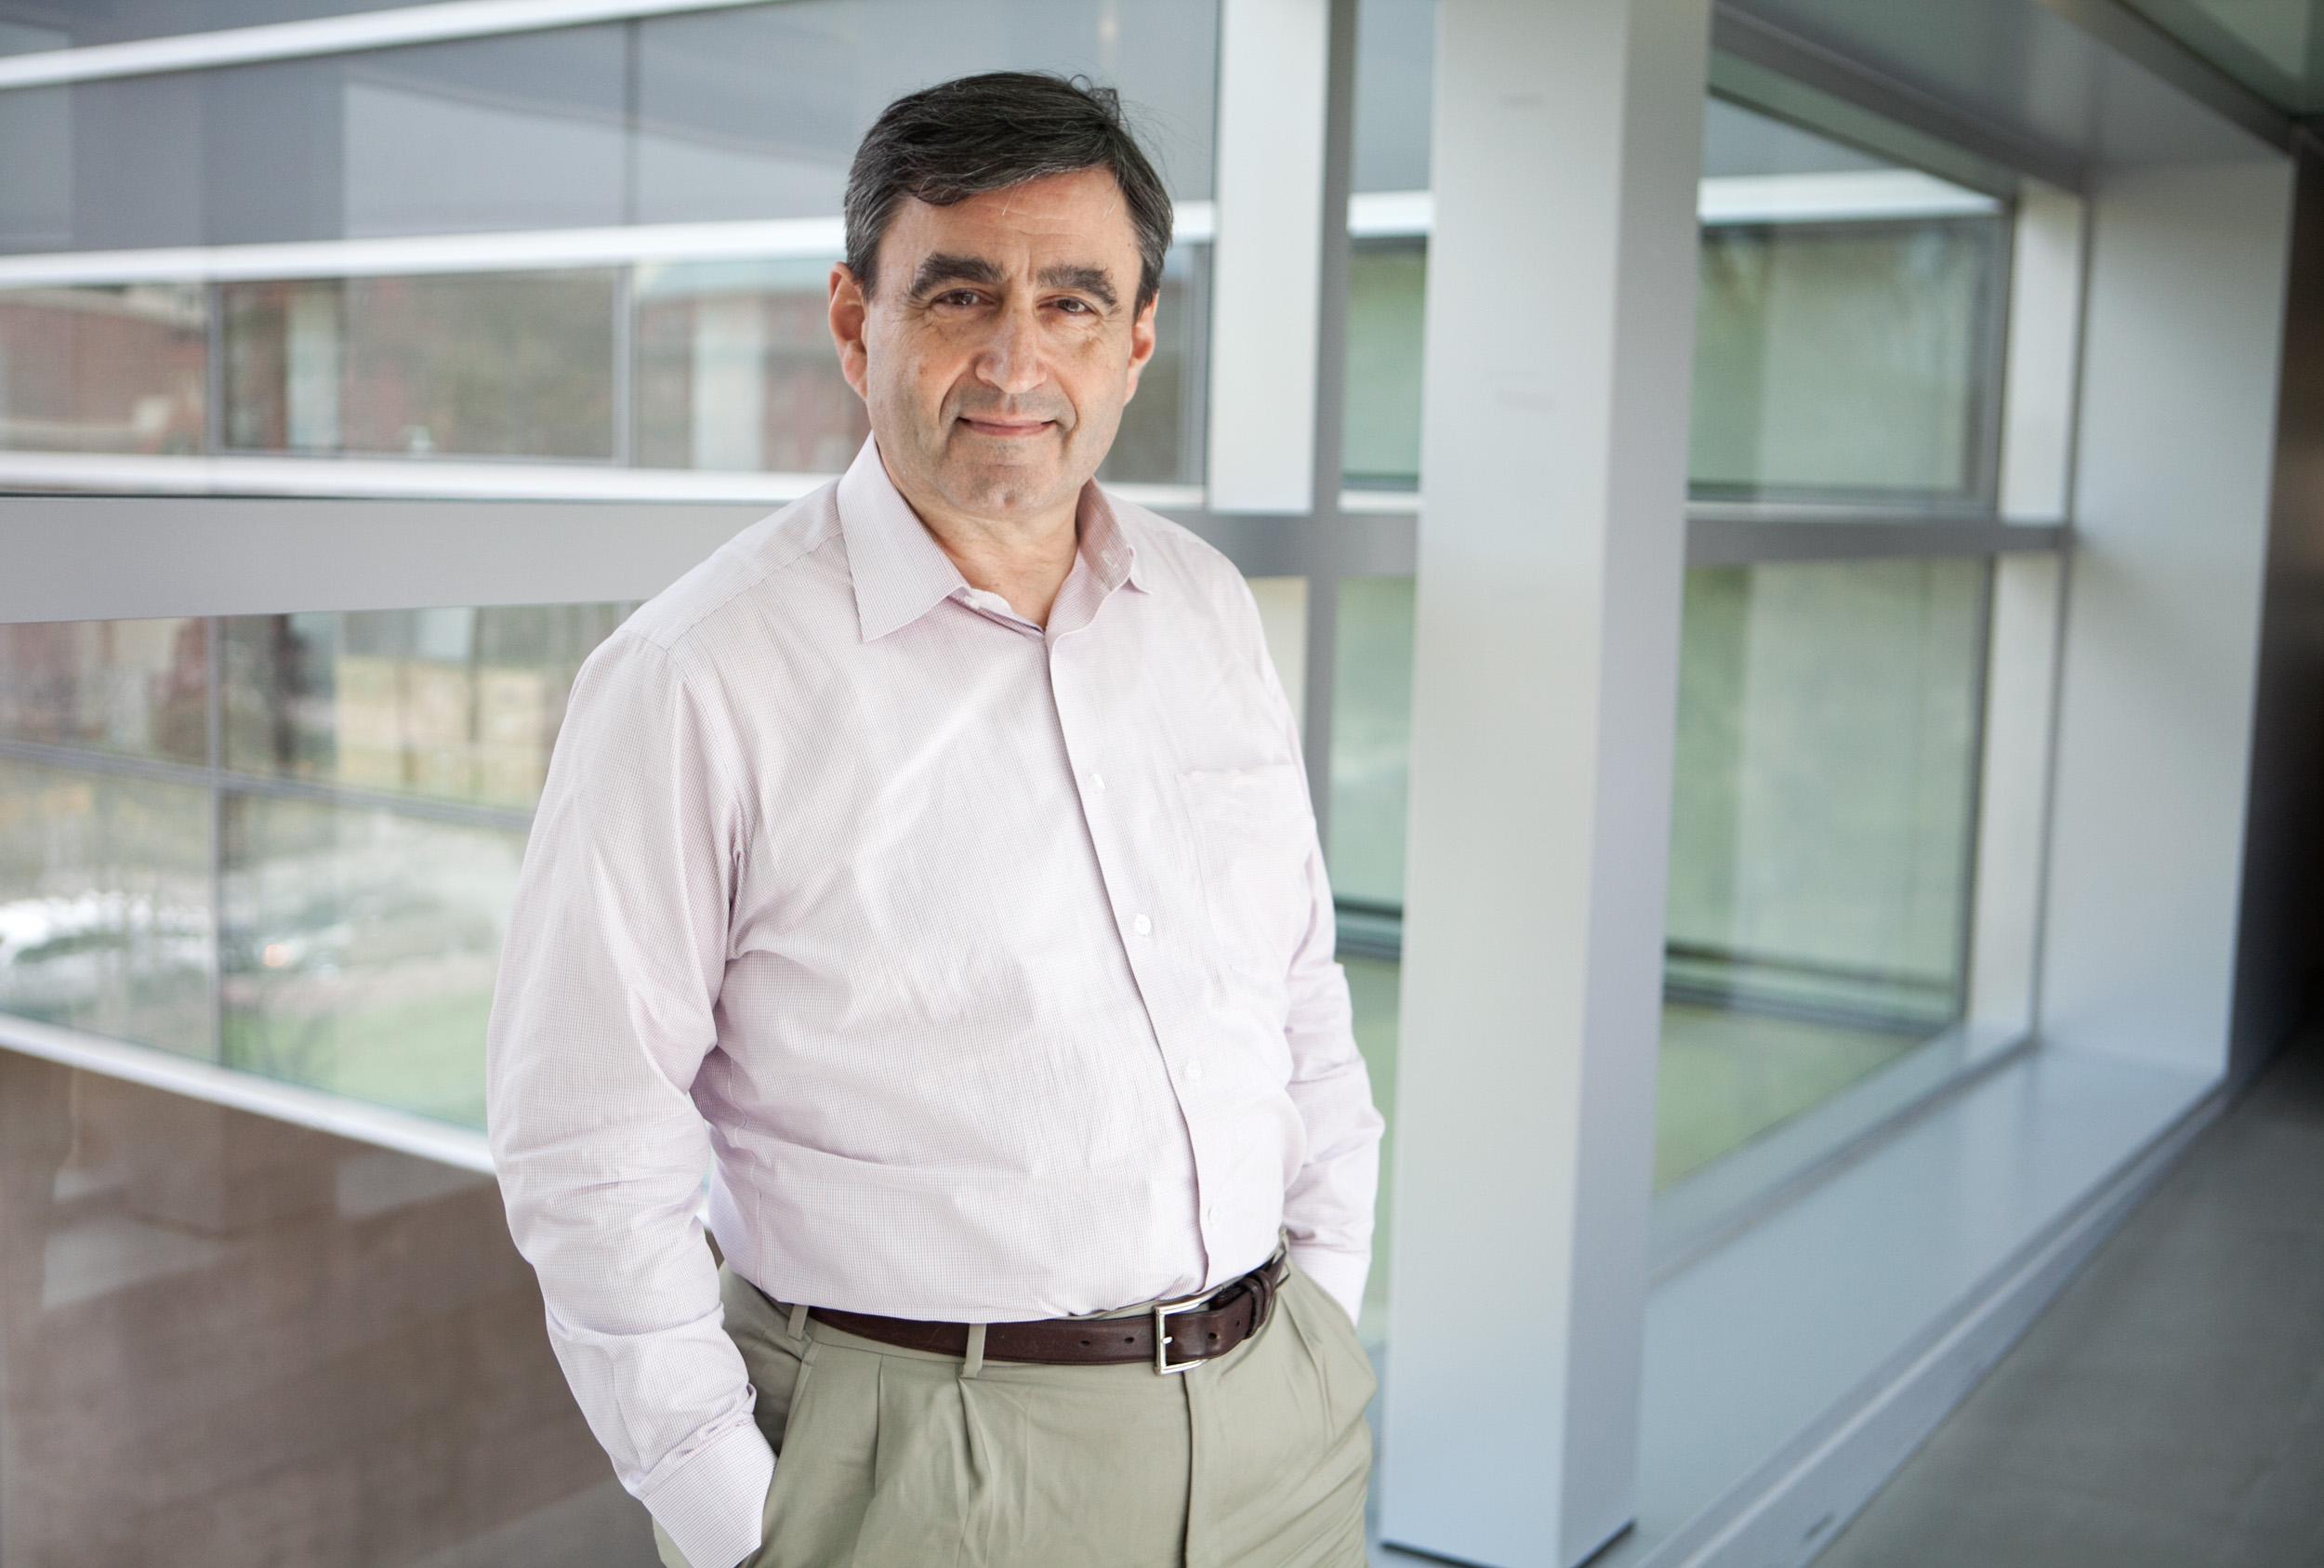 Harvard physics professor wins $500,000 Minerva prize - The Boston Globe